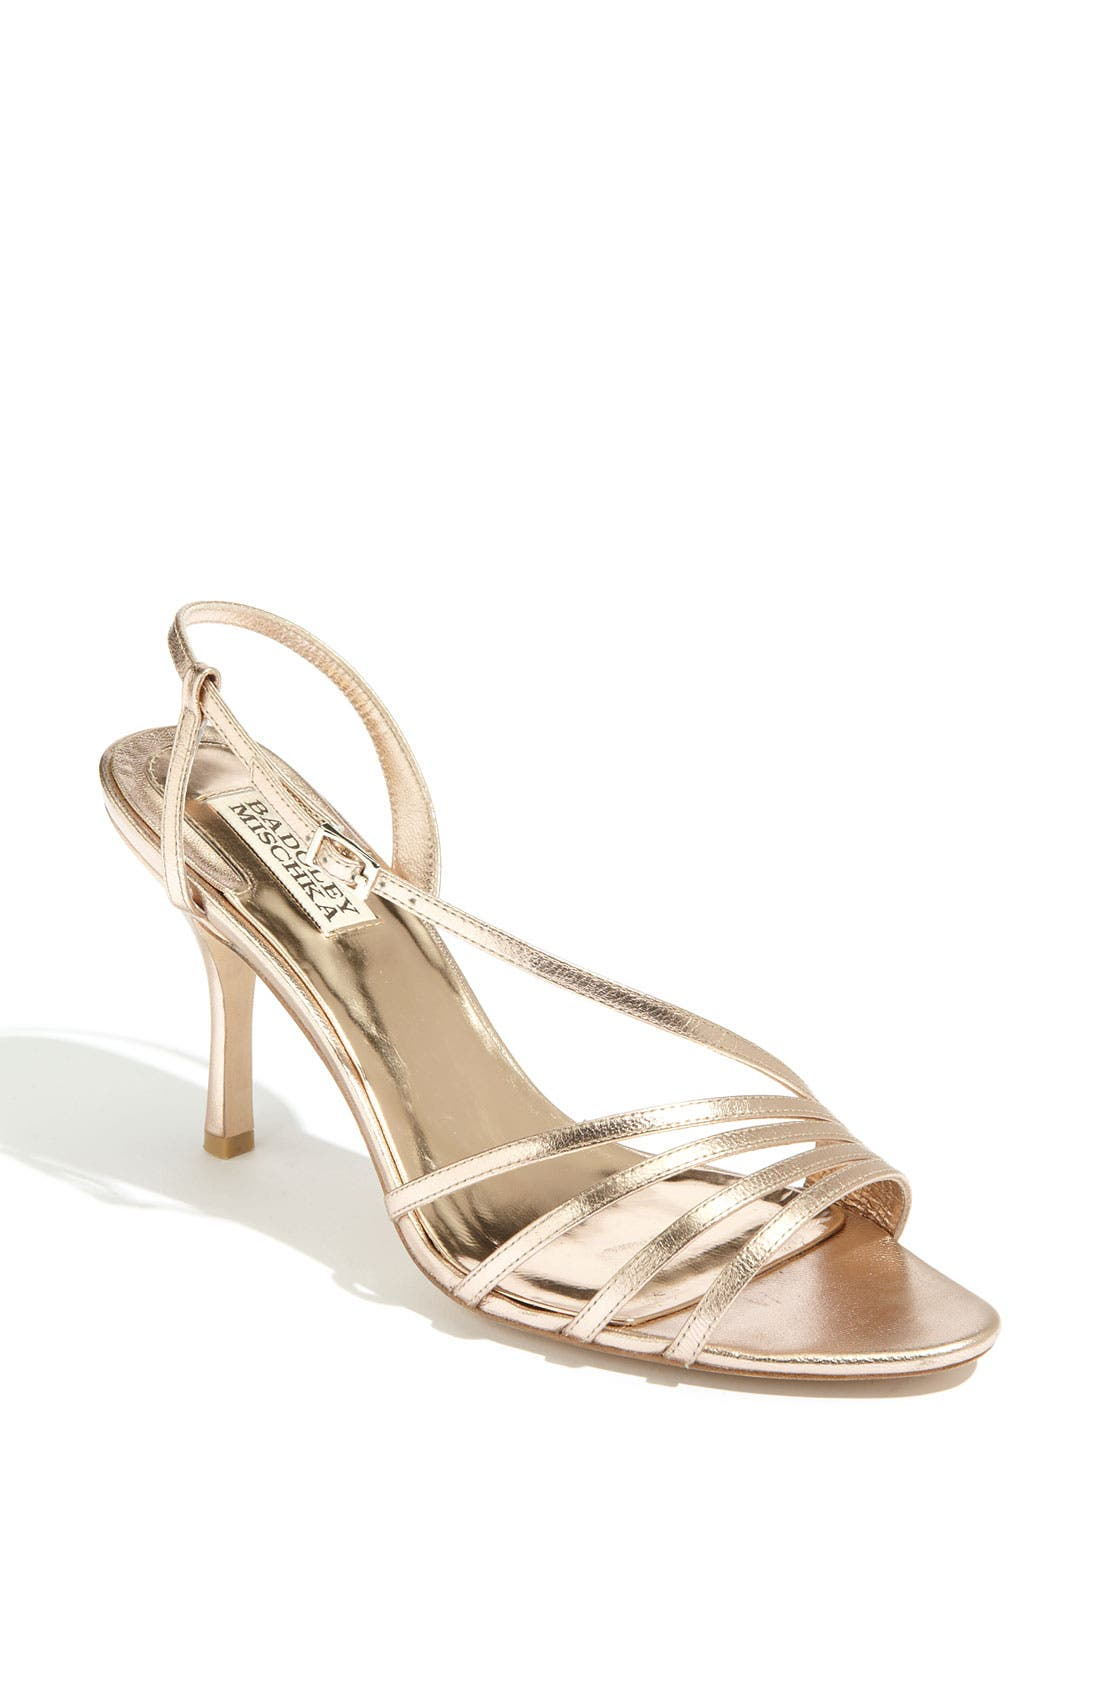 Alternate Image 1 Selected - Badgley Mischka 'Guinevere' Sandal